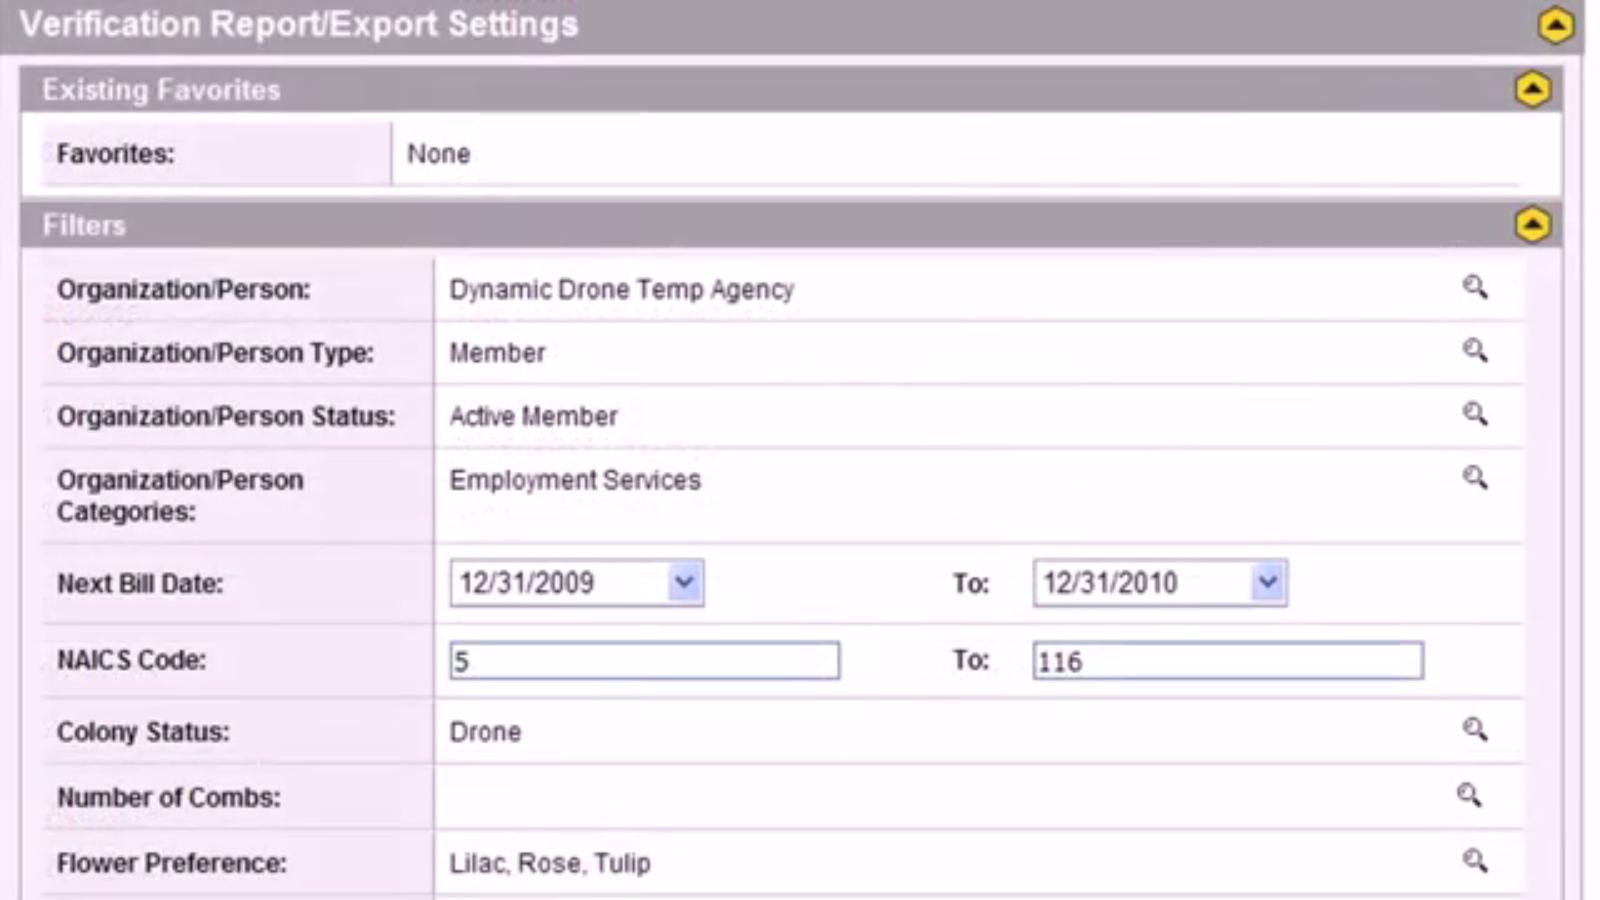 Verification report/export settings